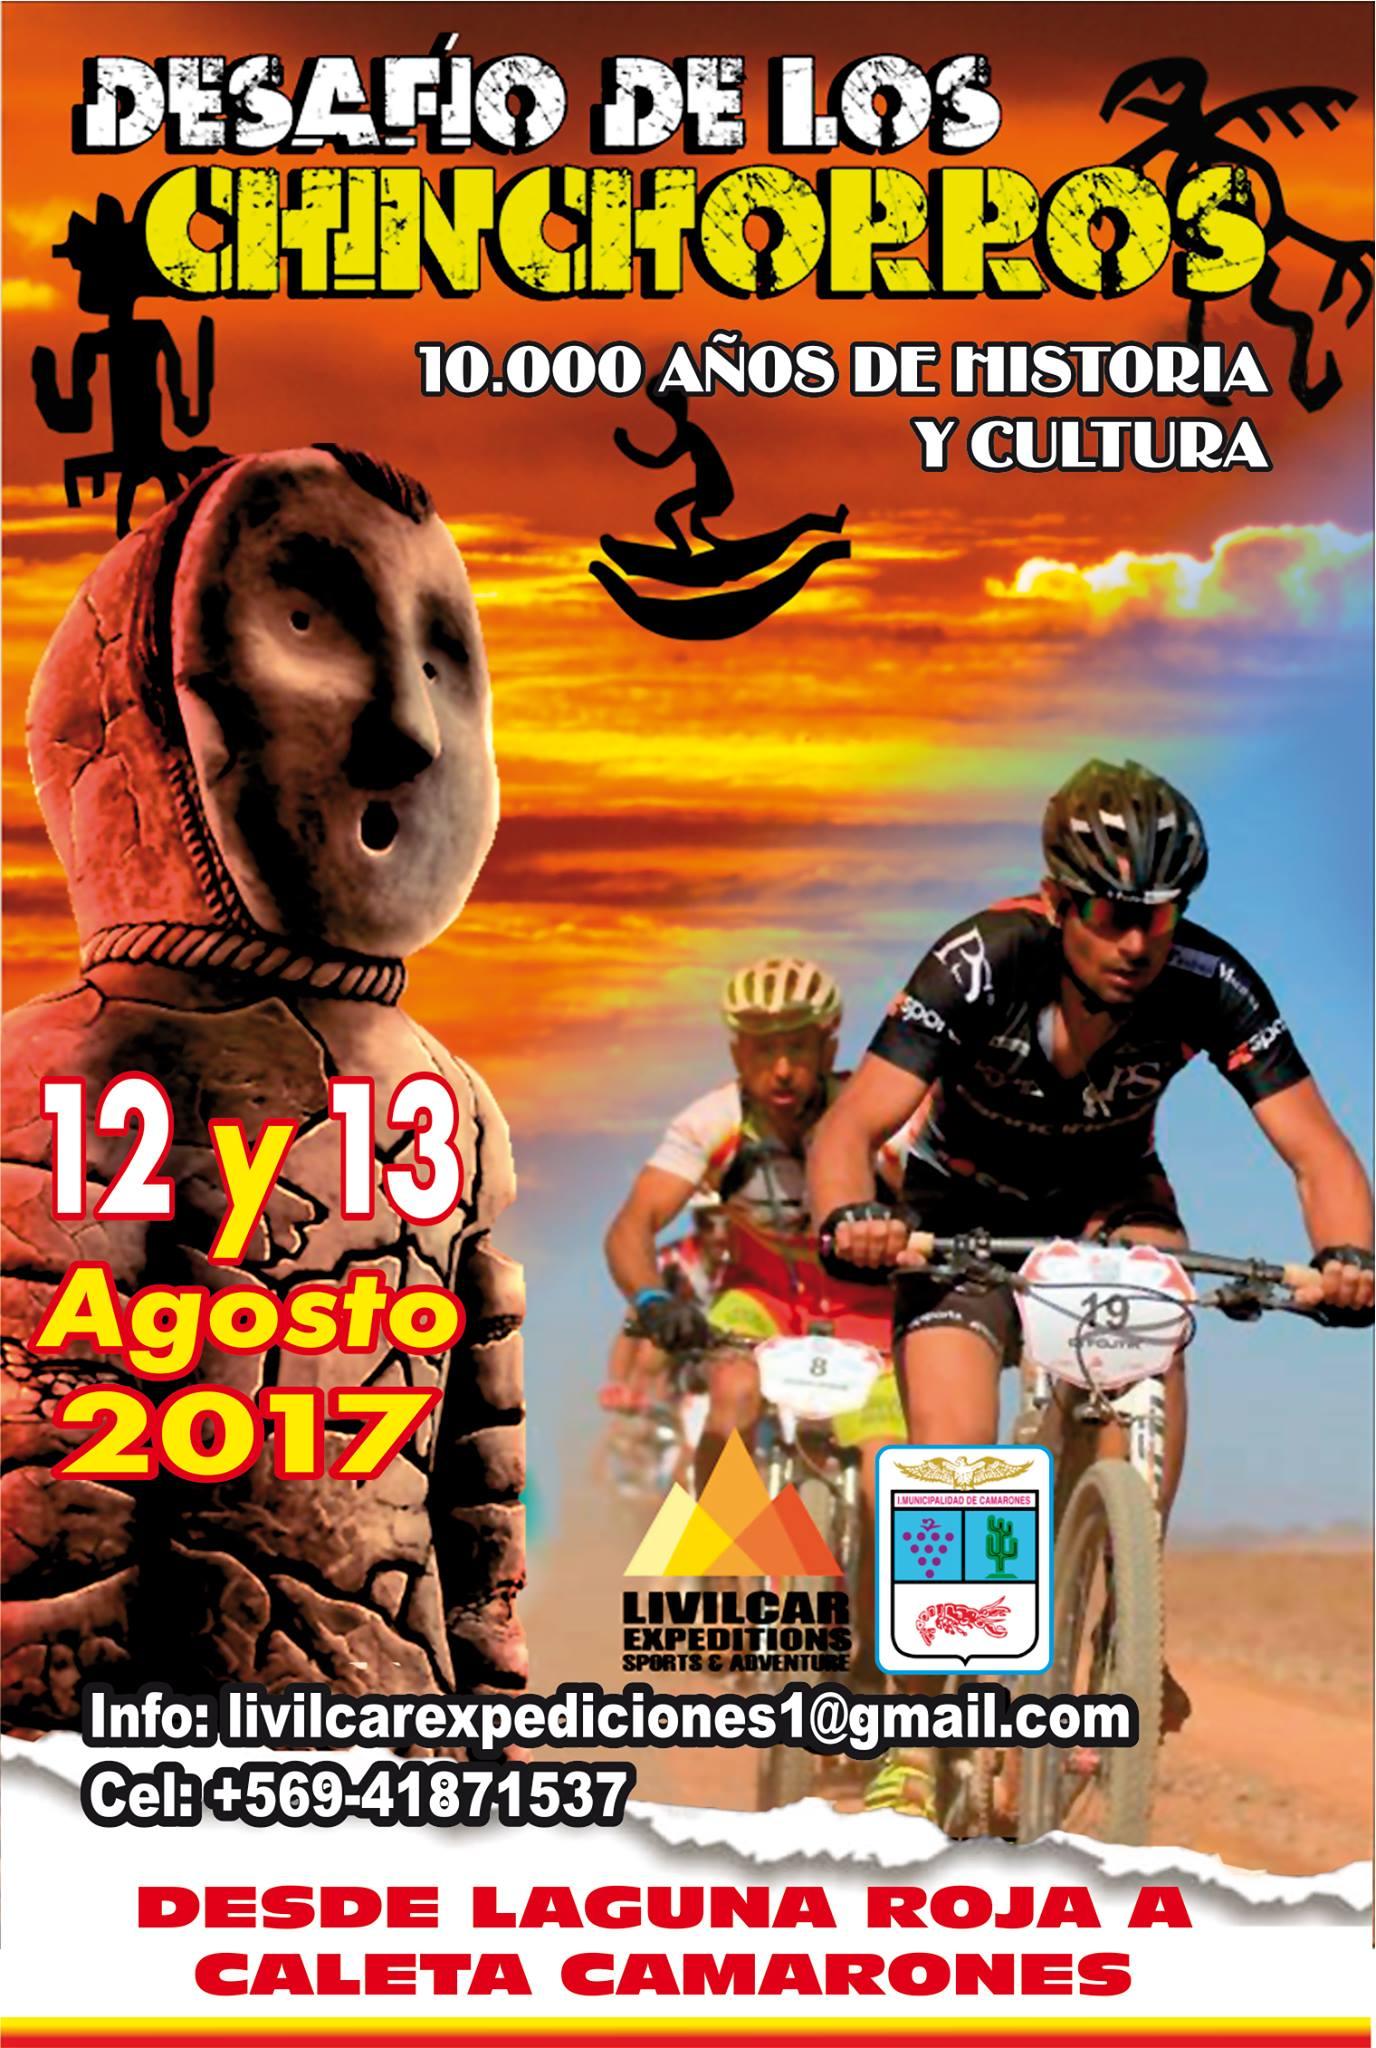 LOS CHINCHORROS 2017-2